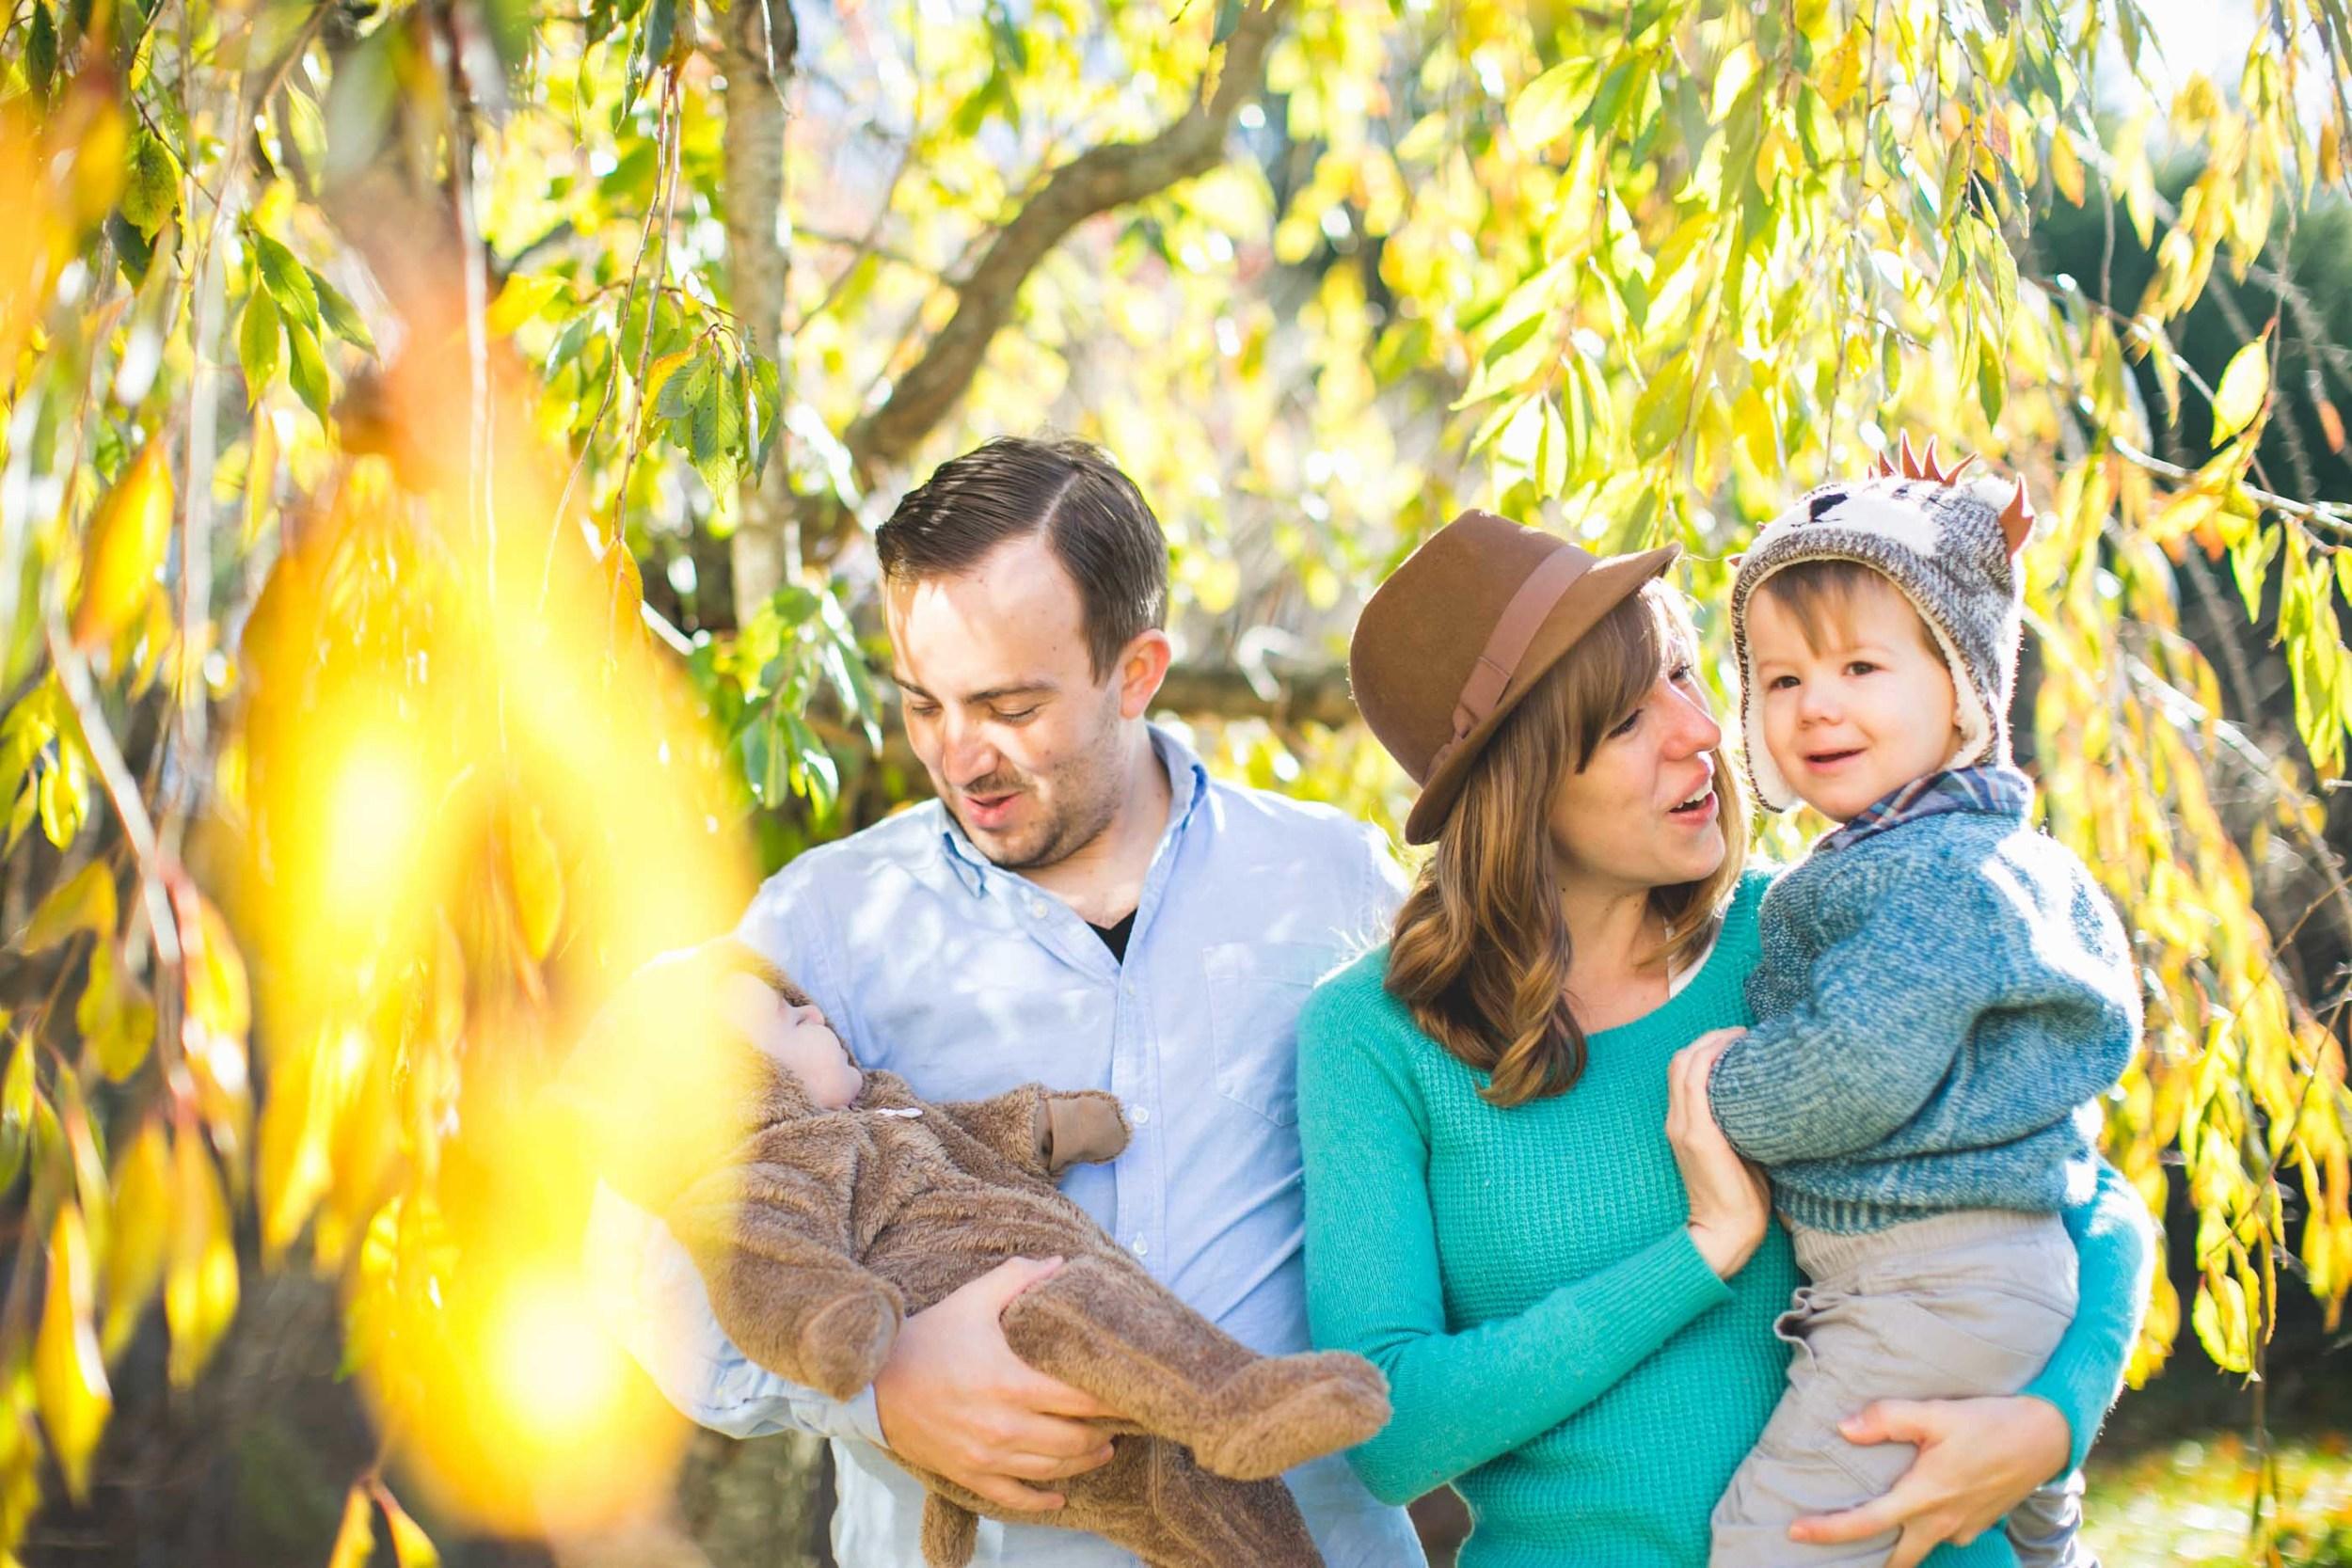 Family-Photographer-Beverly-MA-4-11.jpg